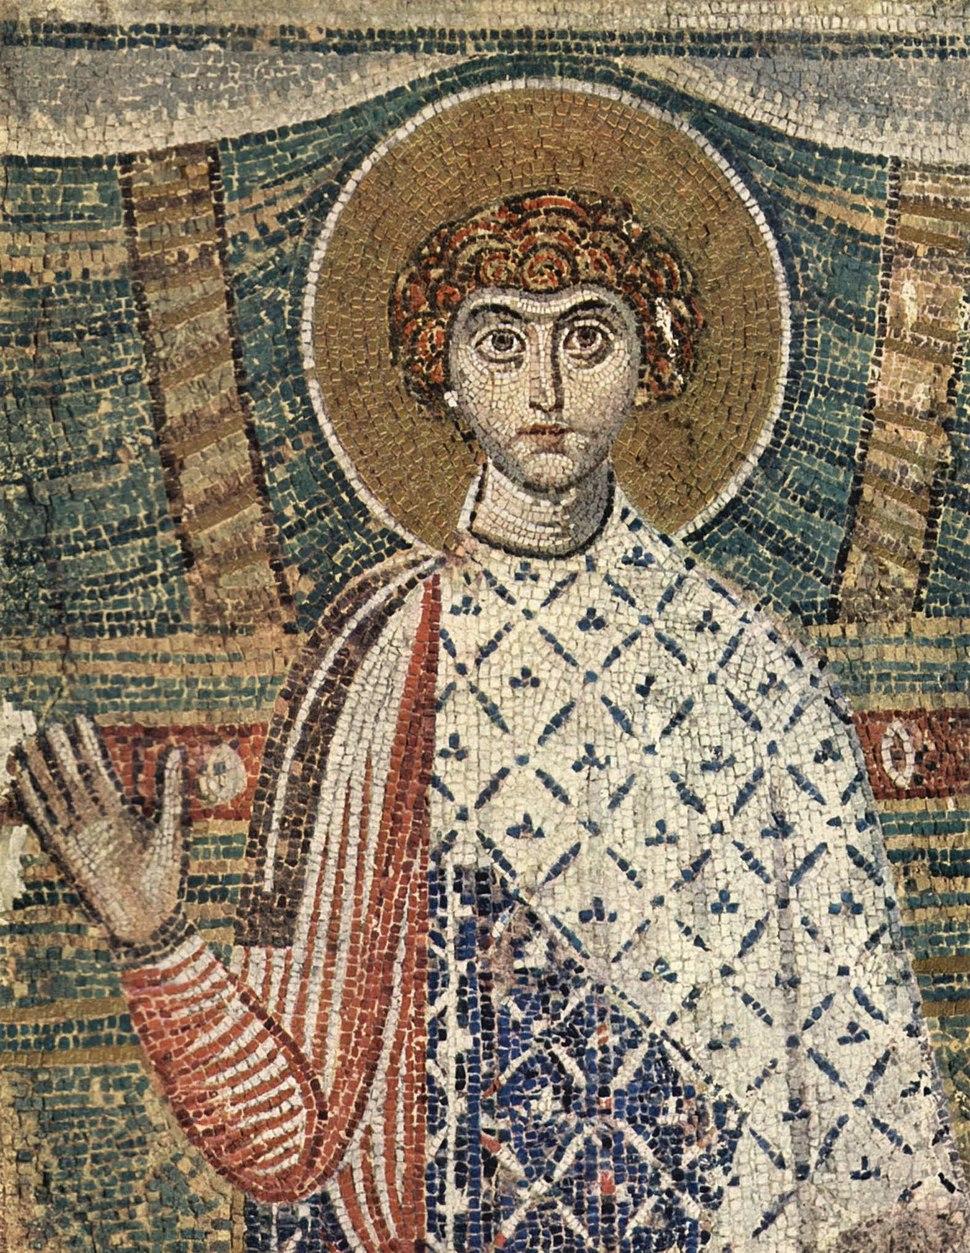 Meister der Demetrius-Kirche in Saloniki 001